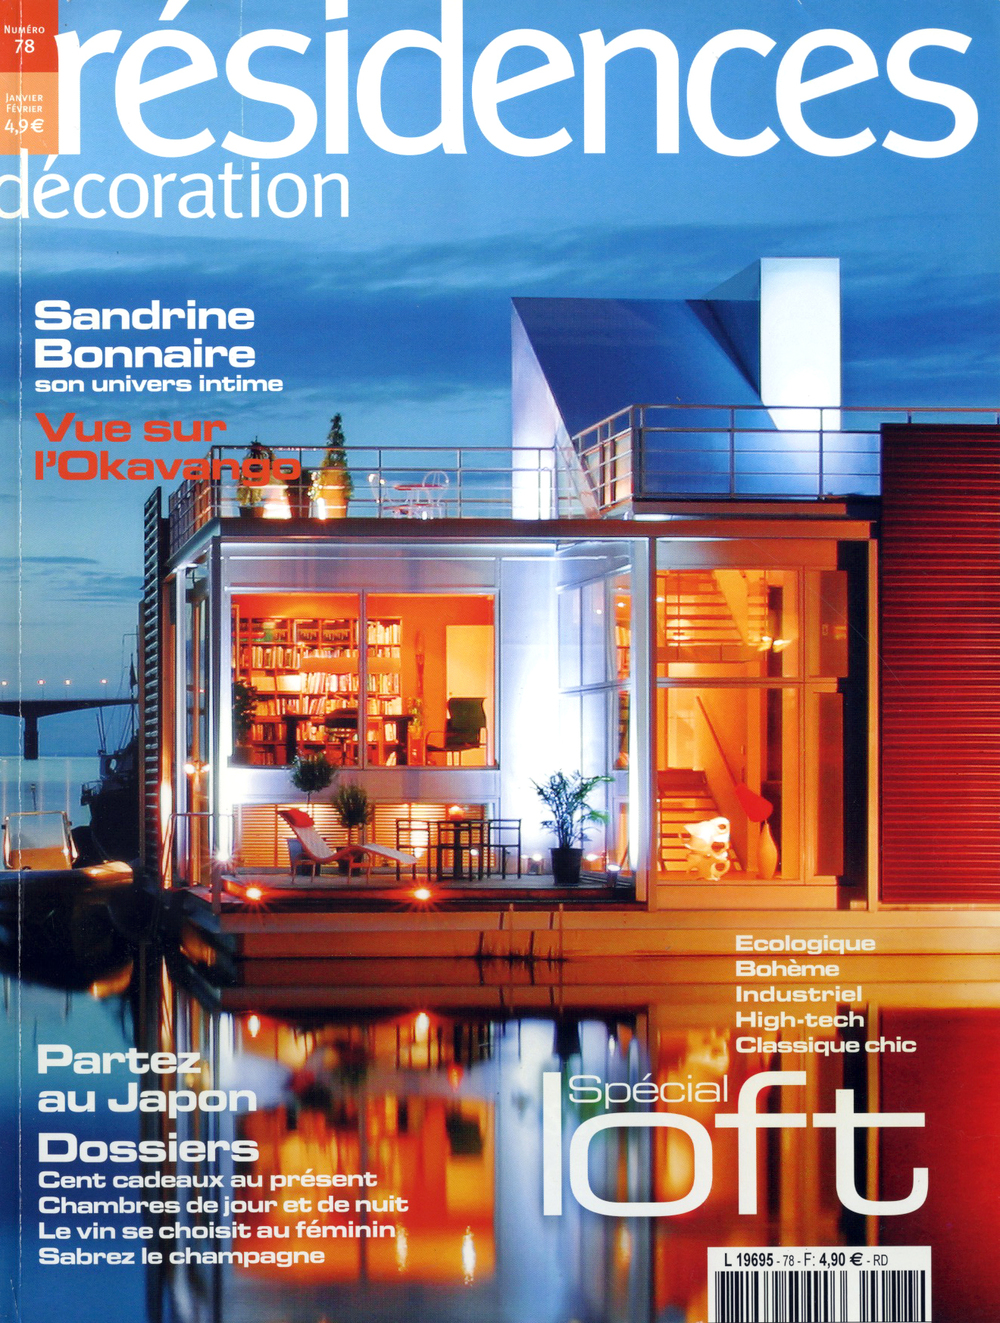 © ghislaine viñas interior design-residences.02.08.jpg